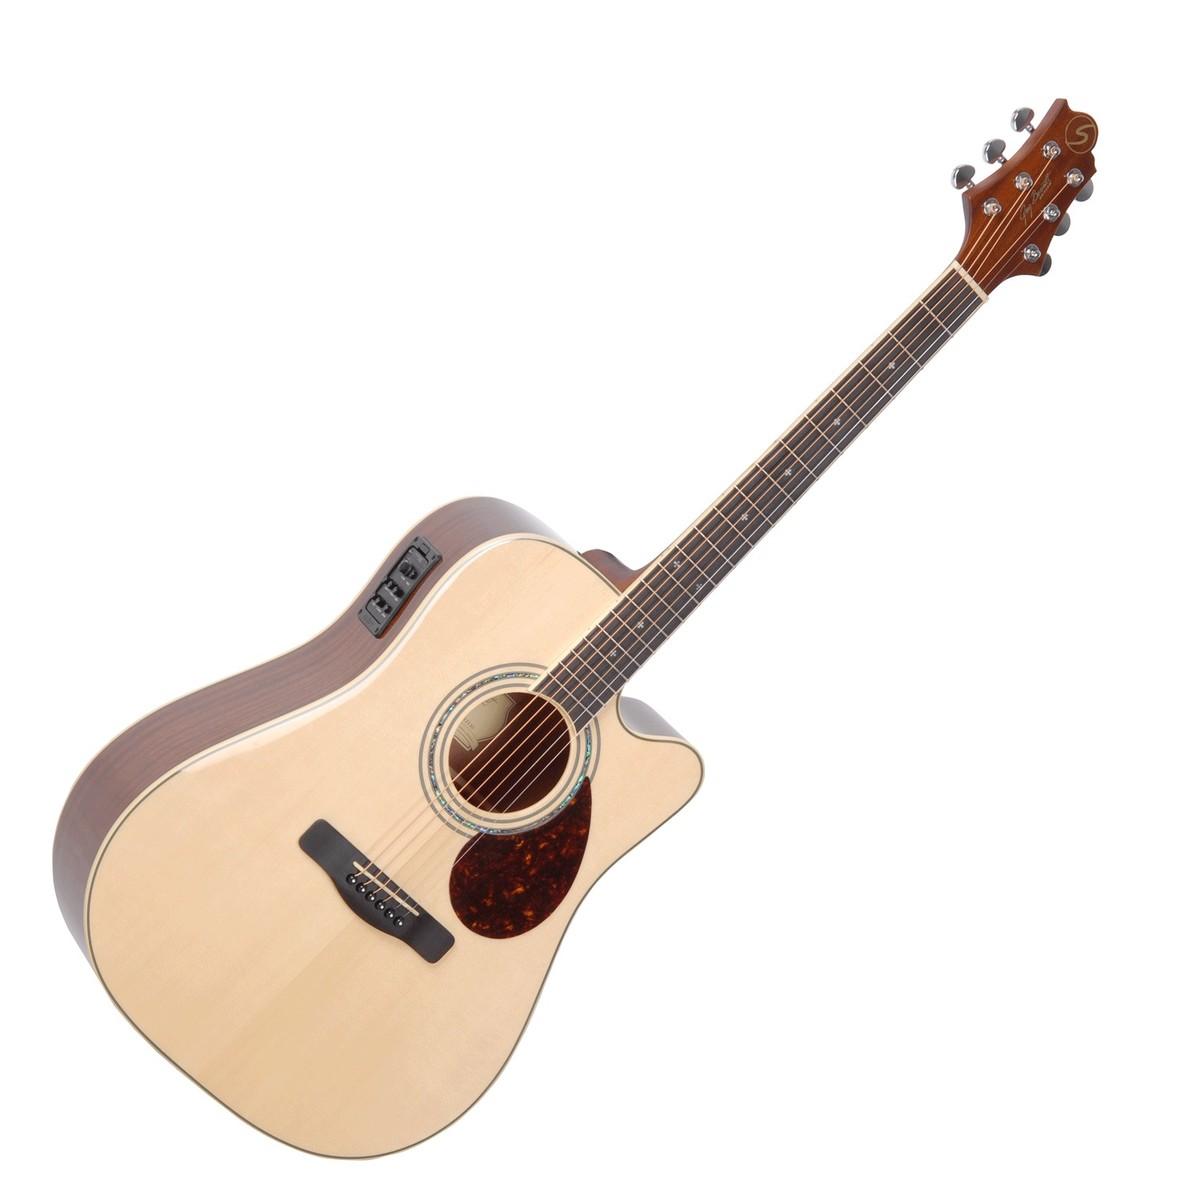 Image of Greg Bennett D-5CE Electro Acoustic Guitar Natural